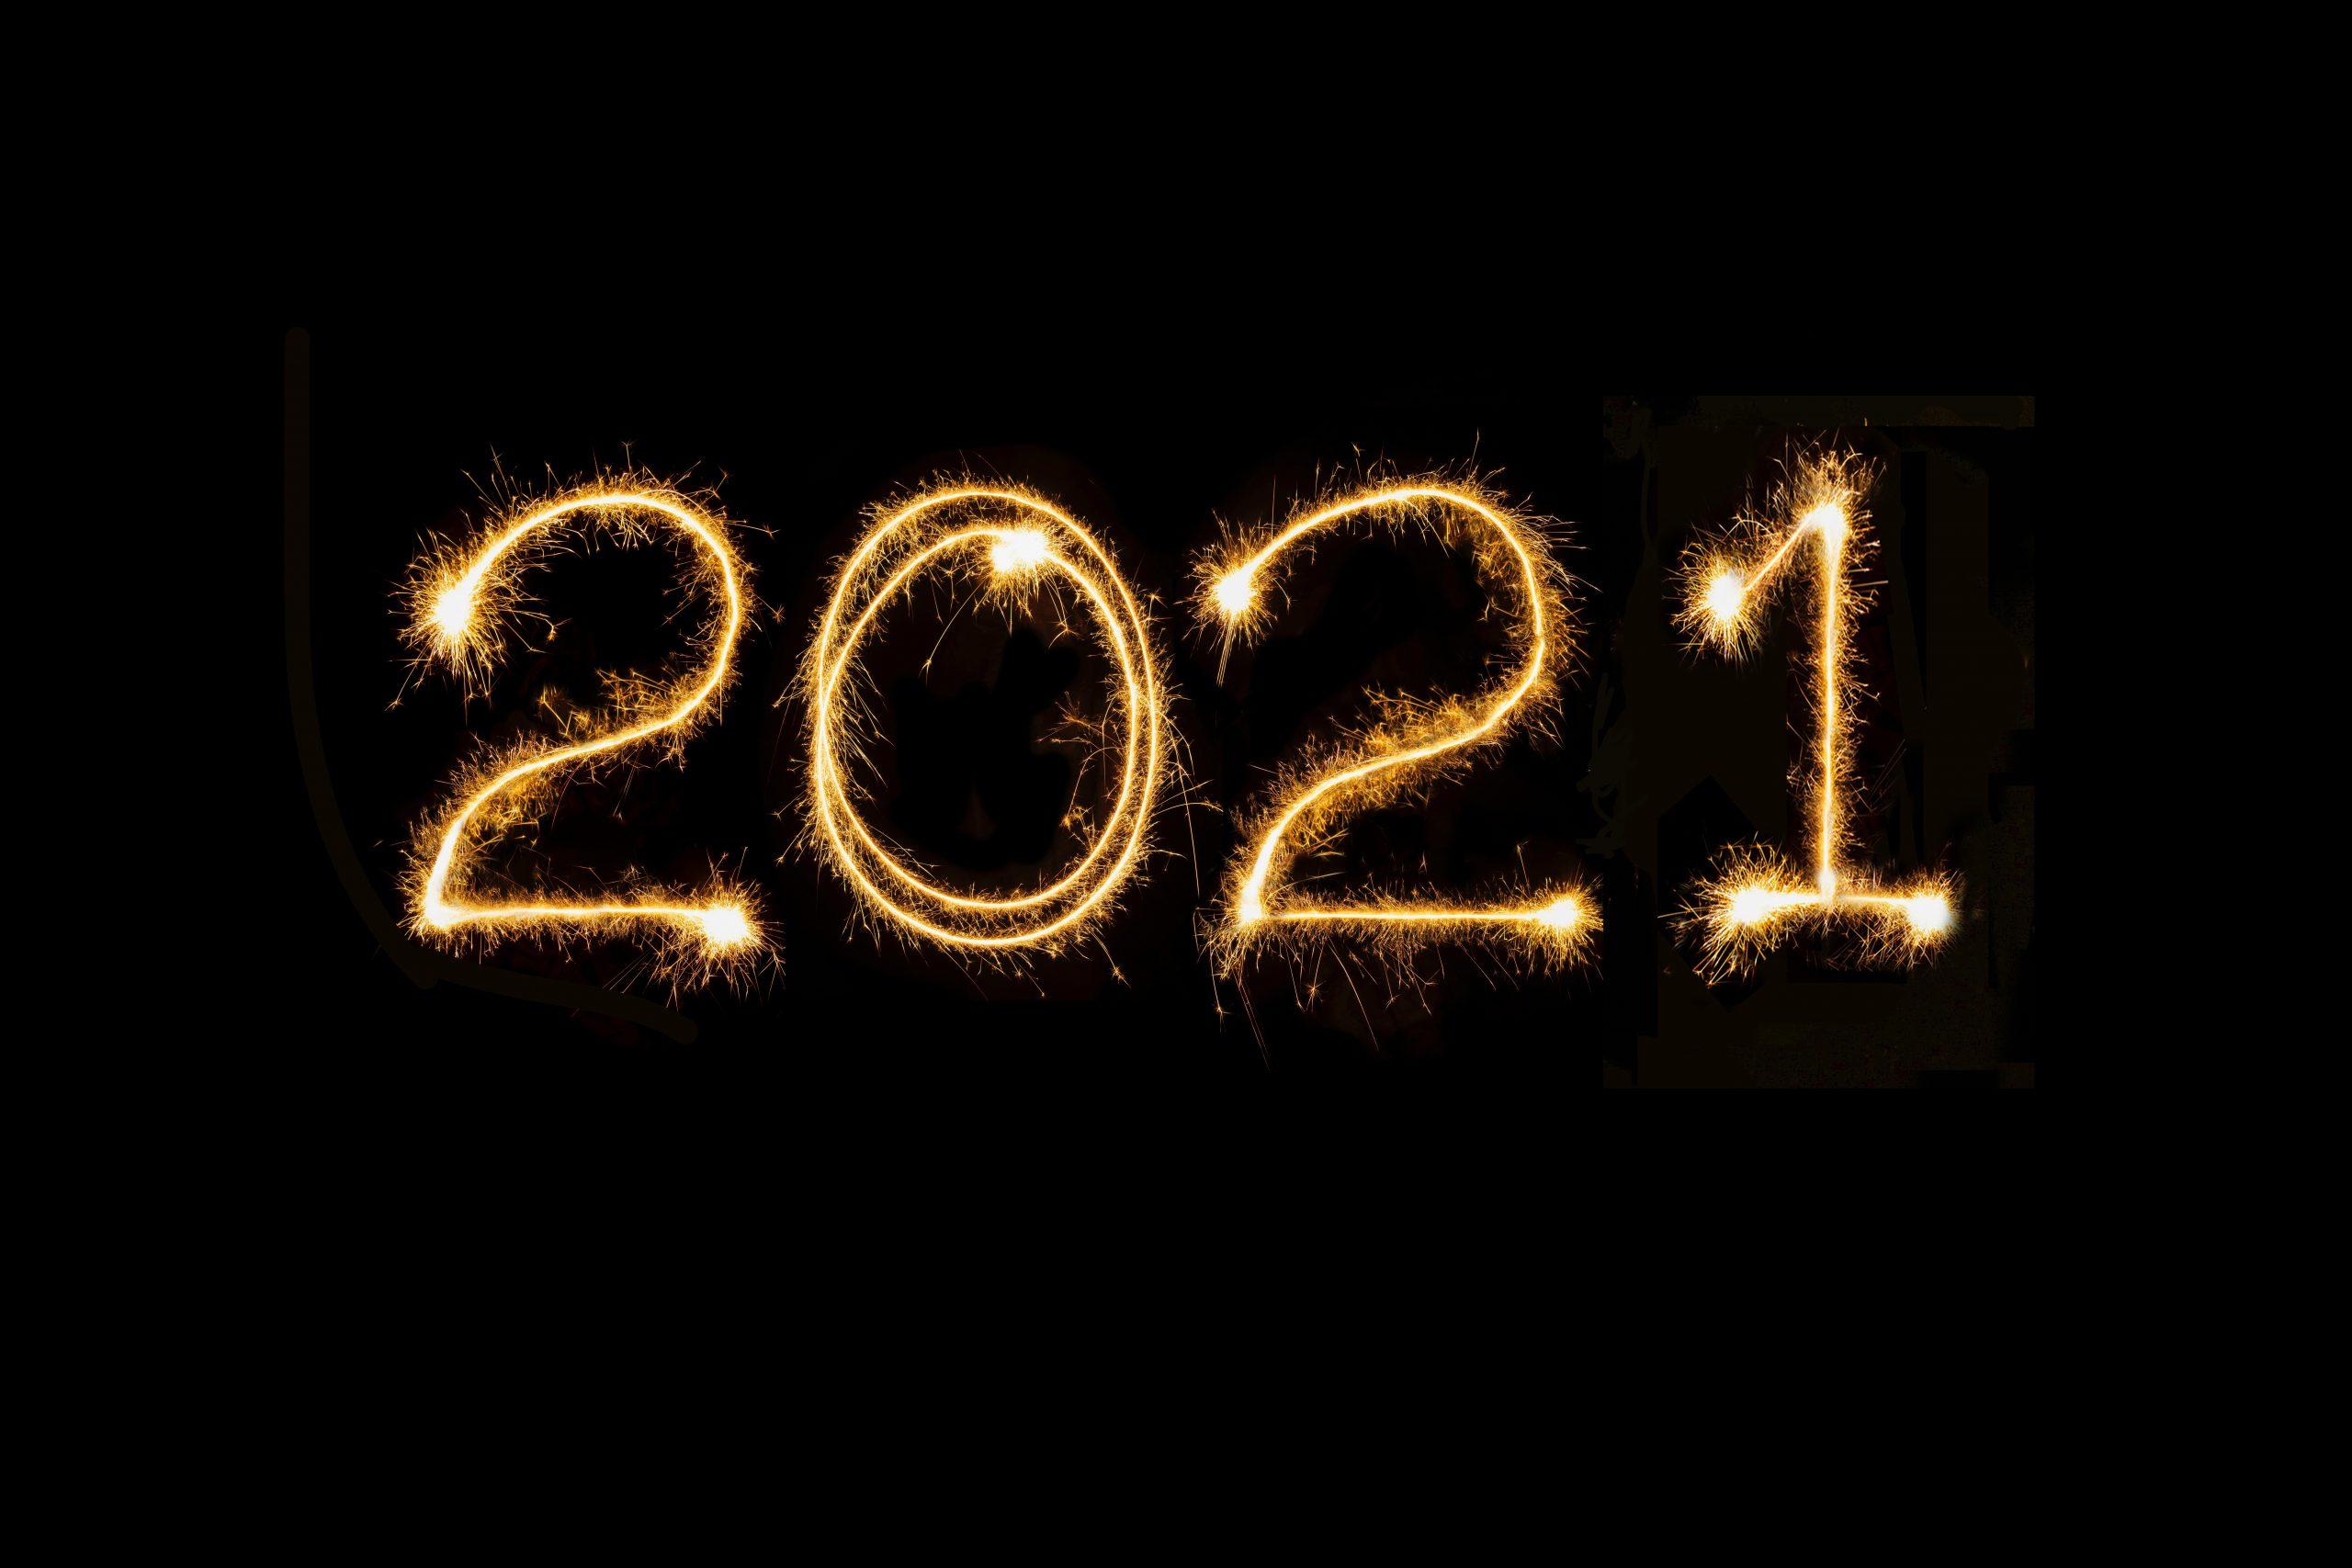 Trinity web design 2021 Goals